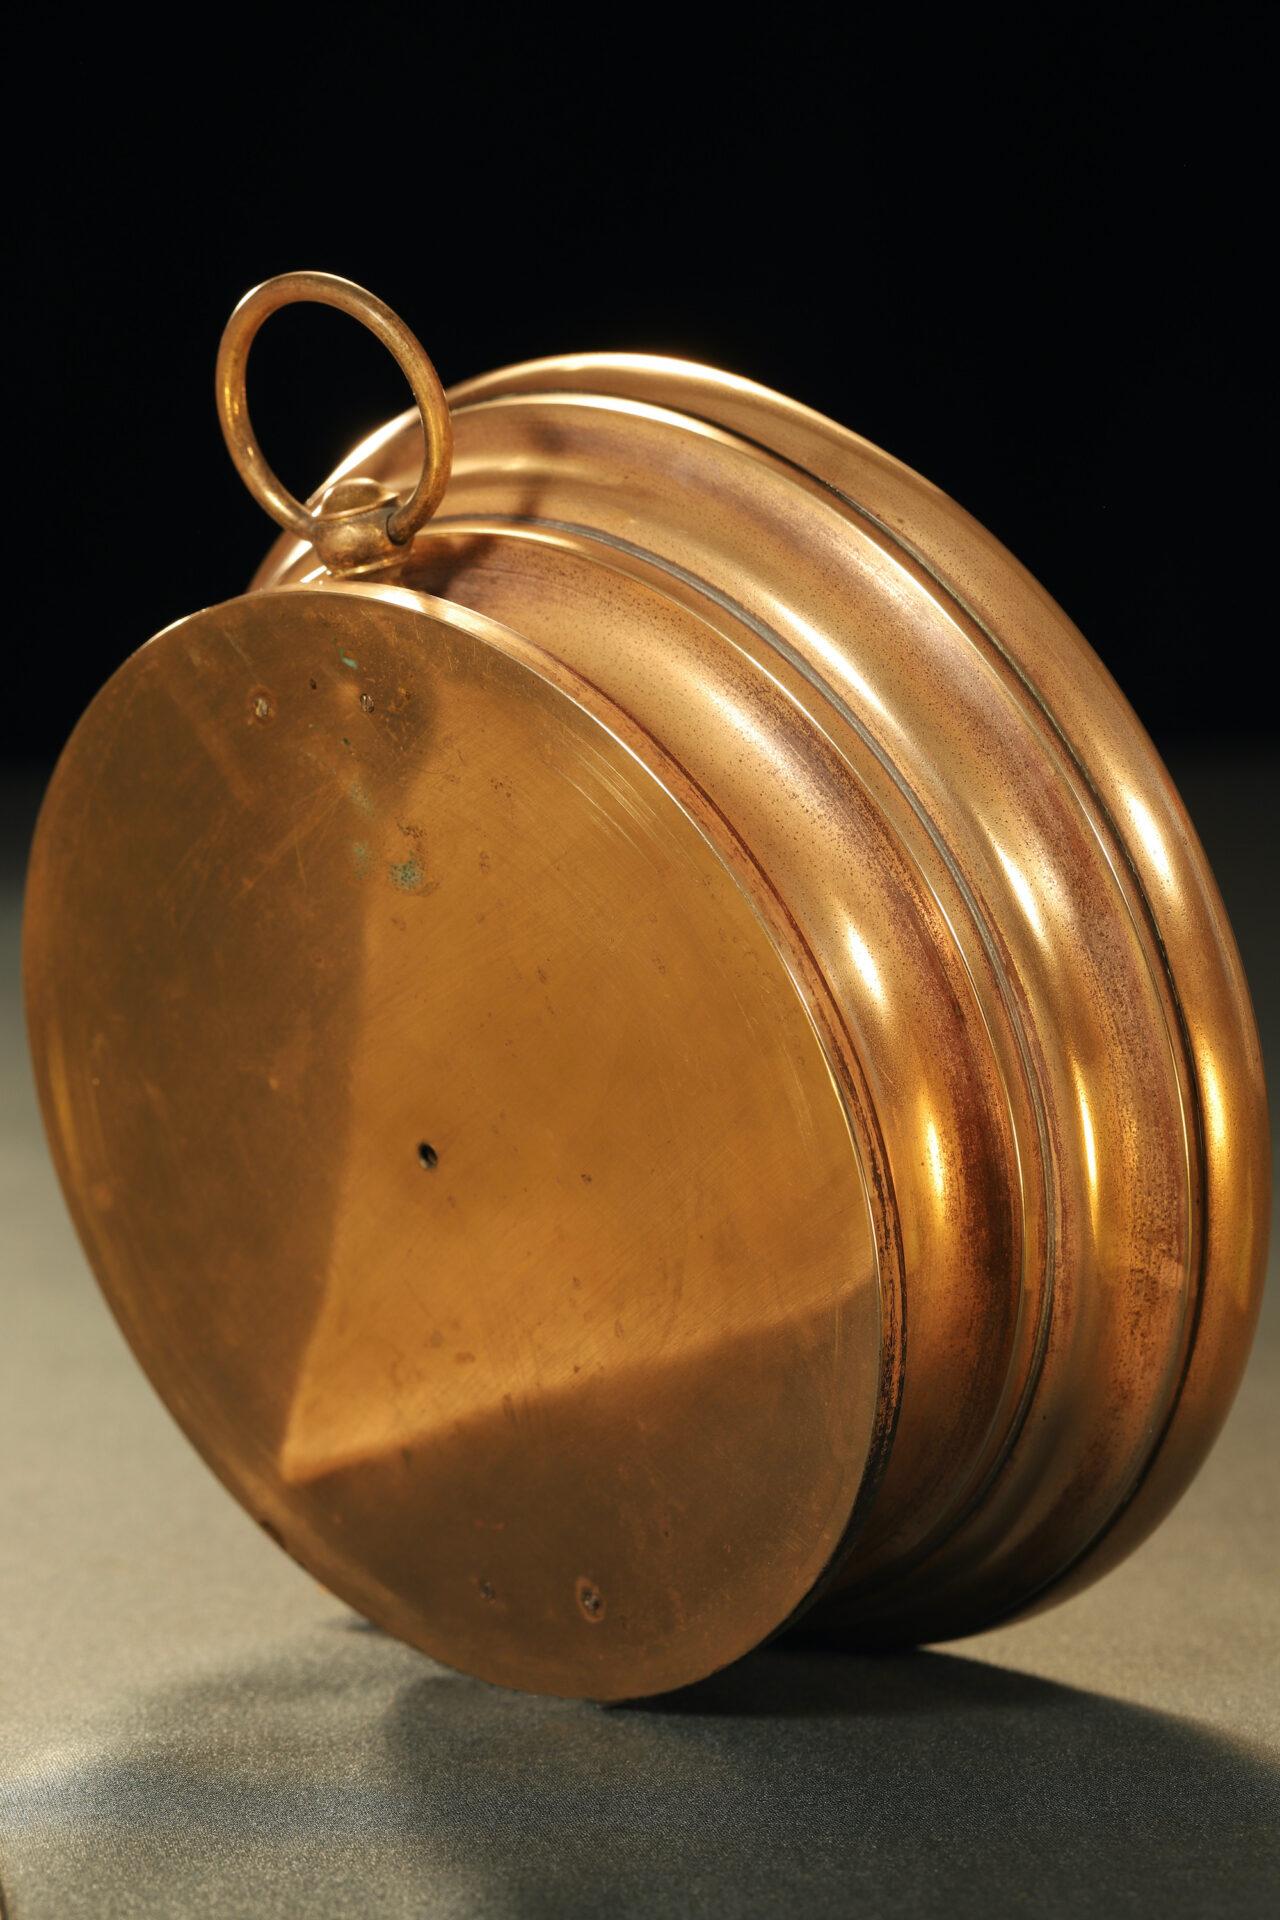 Image of reverse of Bourdon Barometer No 15178 c1880